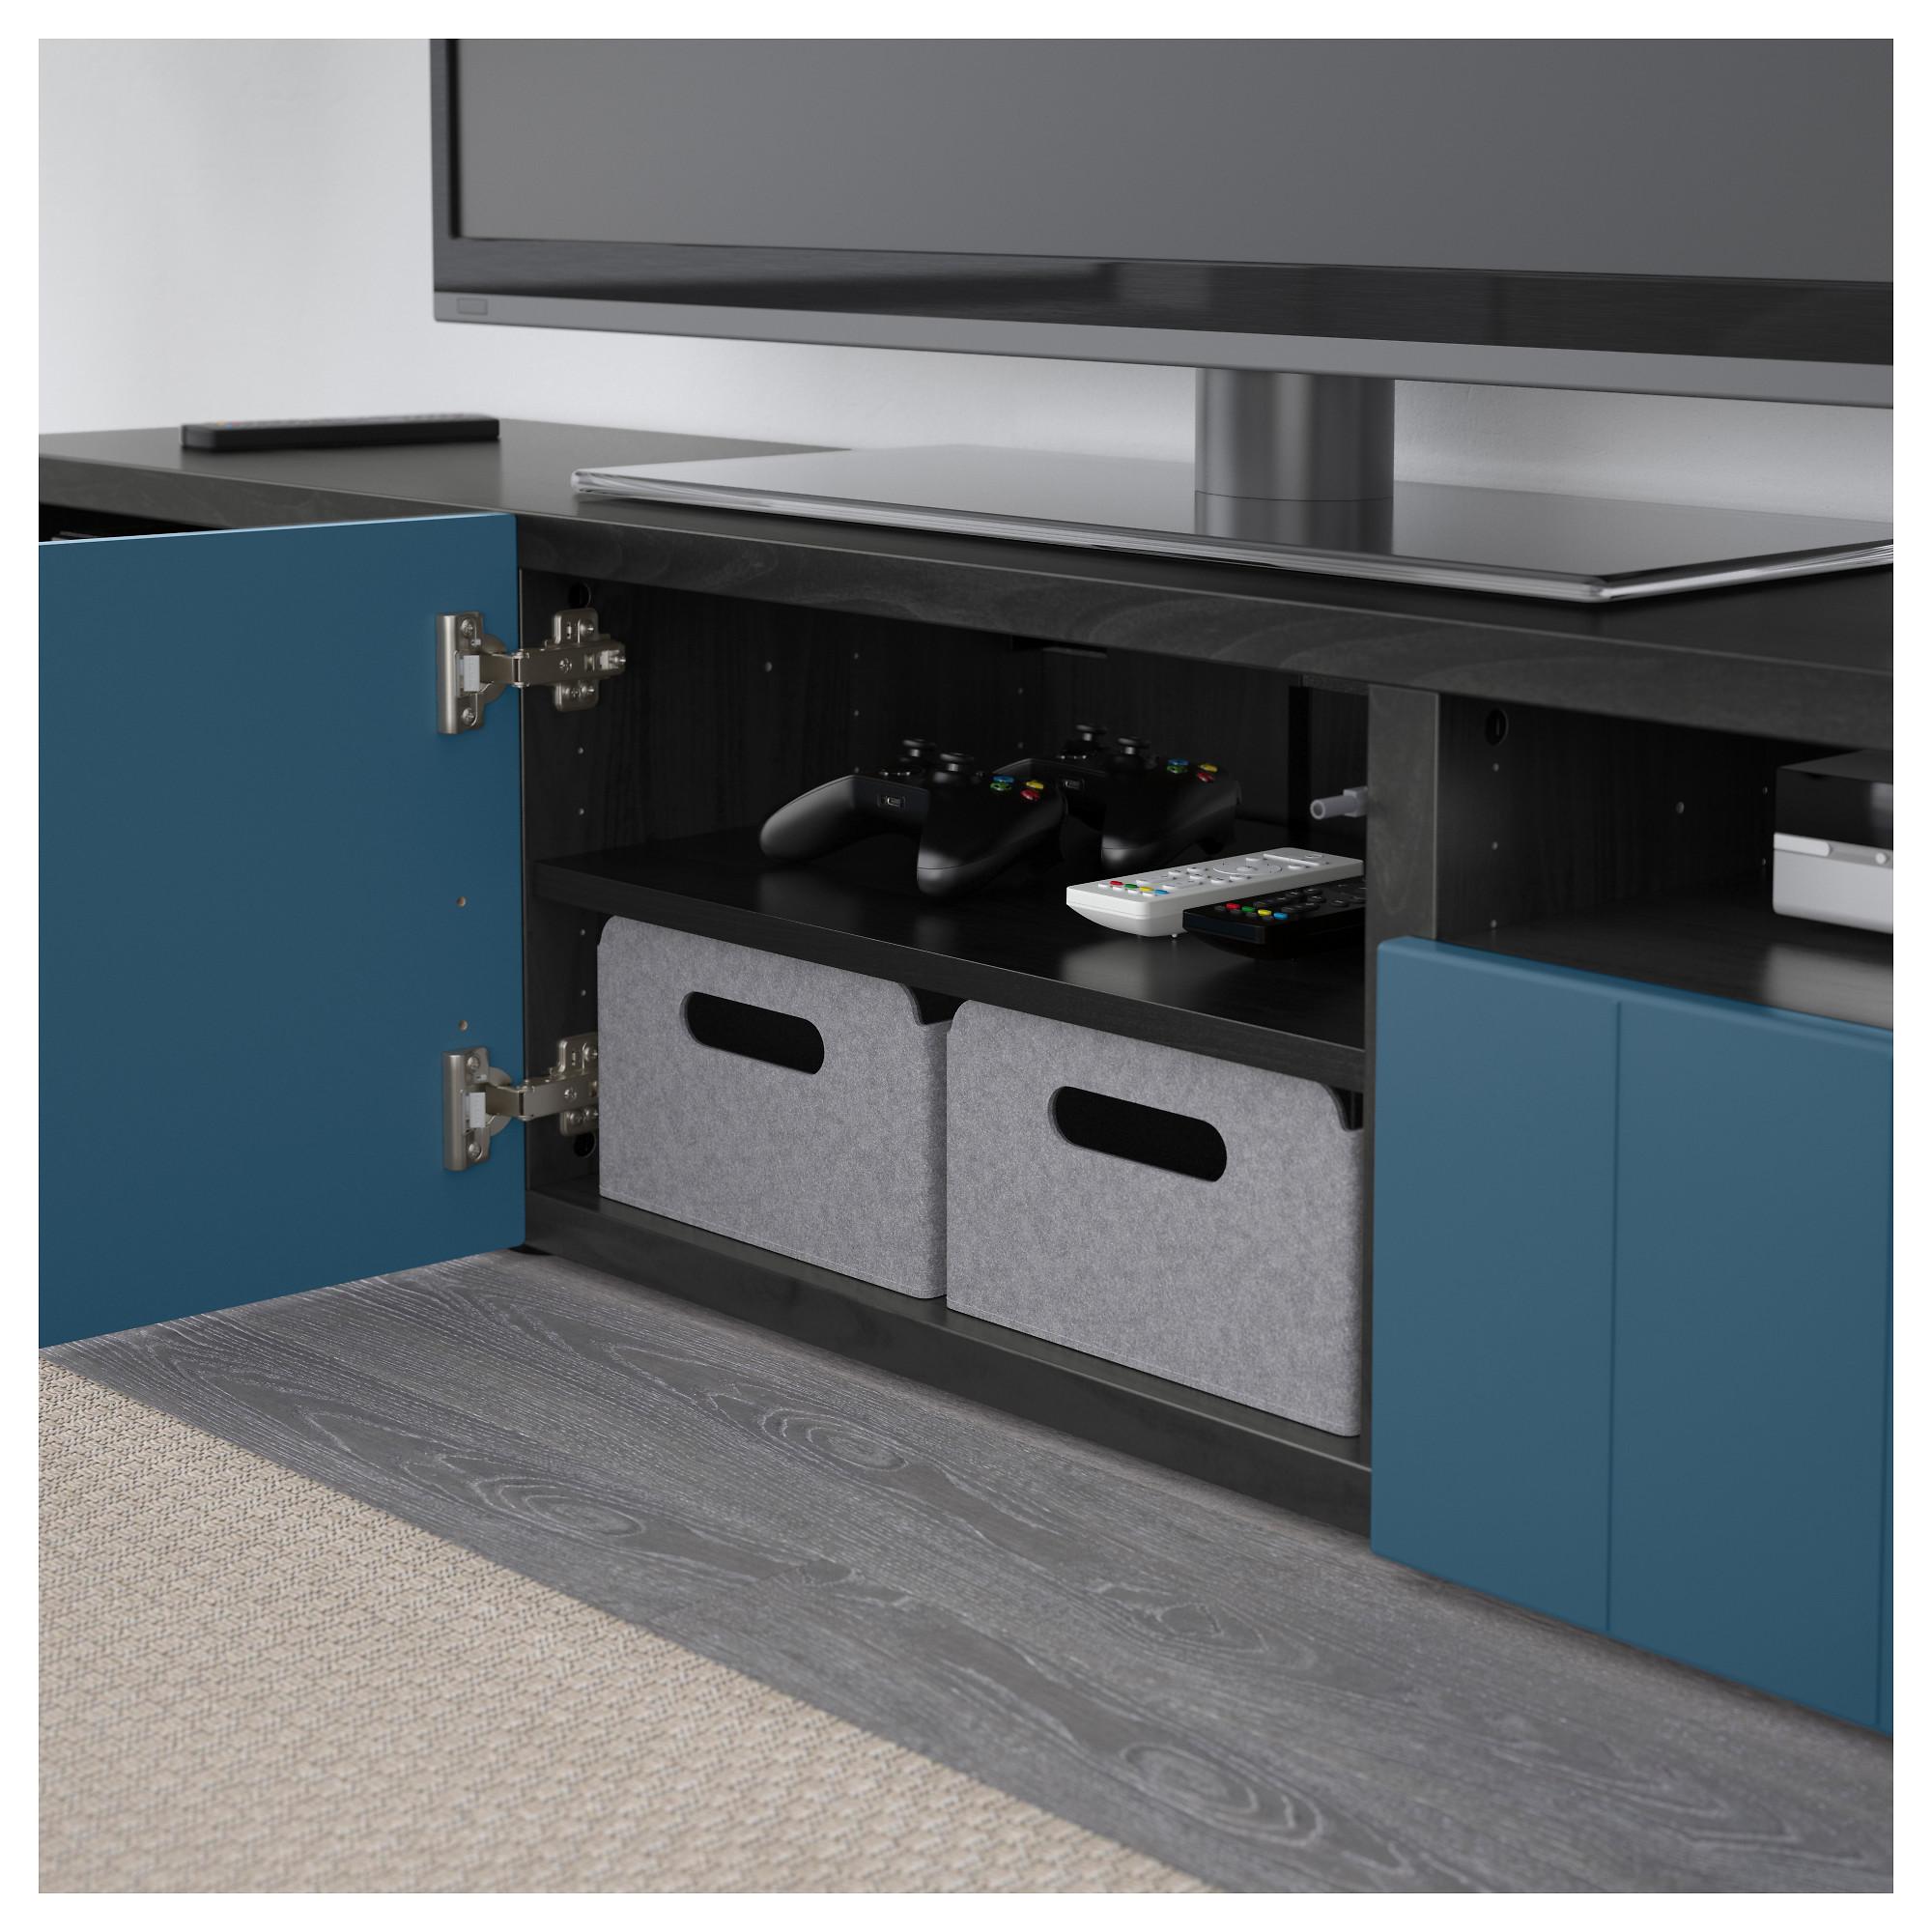 Тумба под ТВ с ящиками и дверцей БЕСТО темно-синий артикуль № 492.758.37 в наличии. Online сайт IKEA Минск. Быстрая доставка и установка.